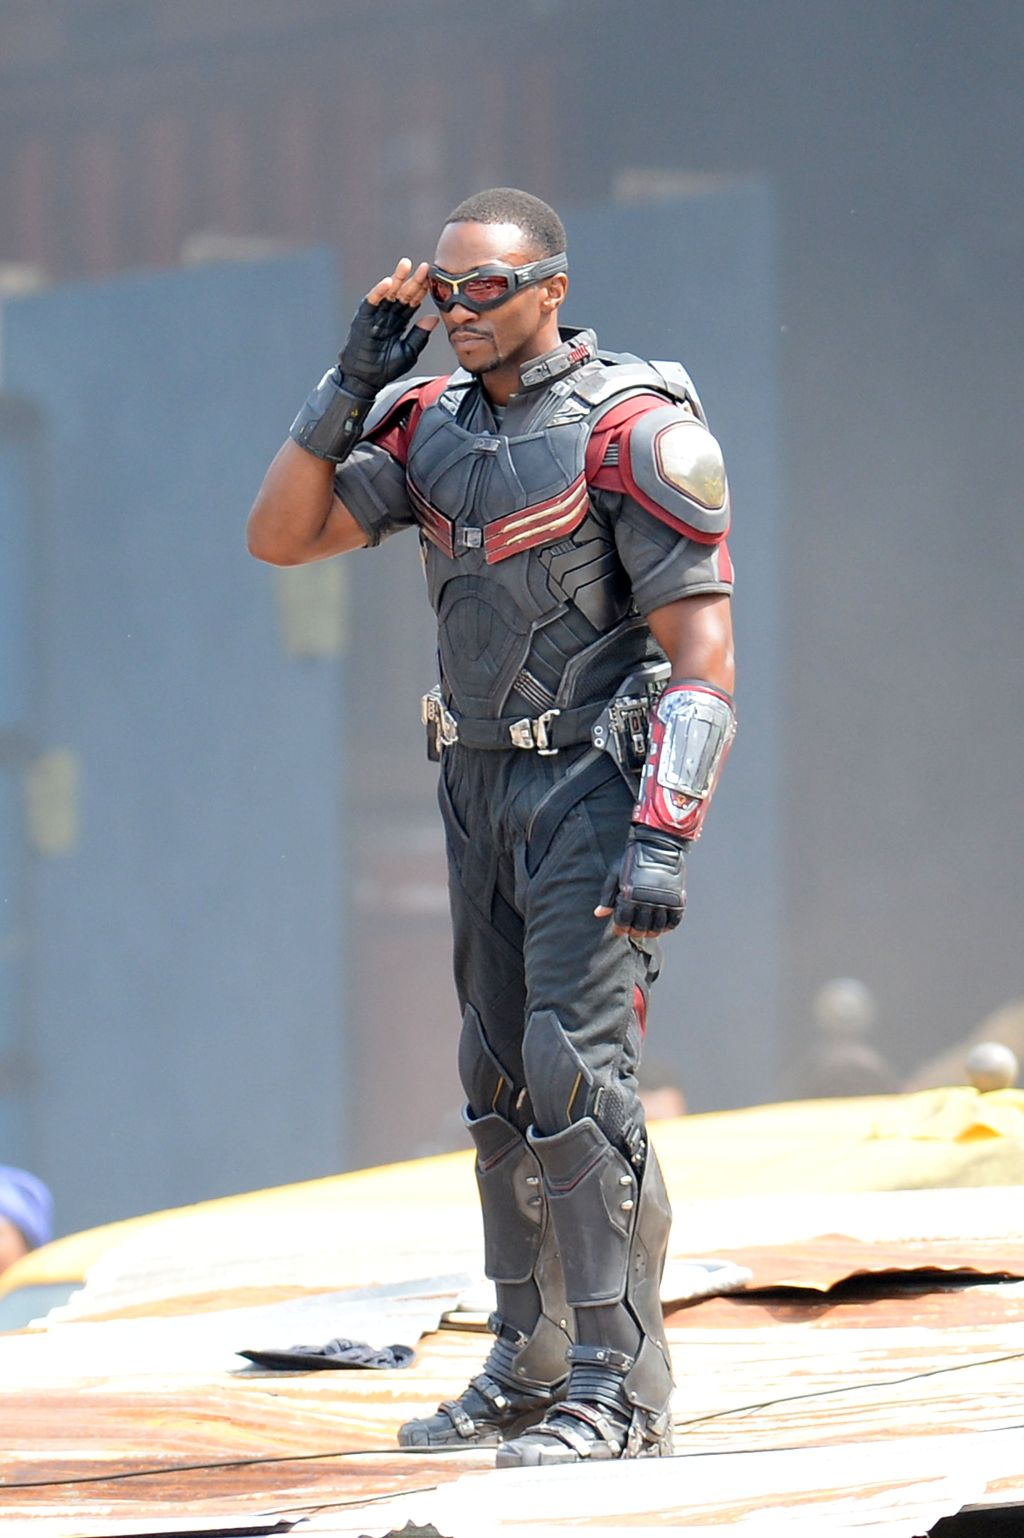 Anthony Mackie strikes a pose as Falcon on the set of Captain America: Civil War in Atlanta, Georgia.